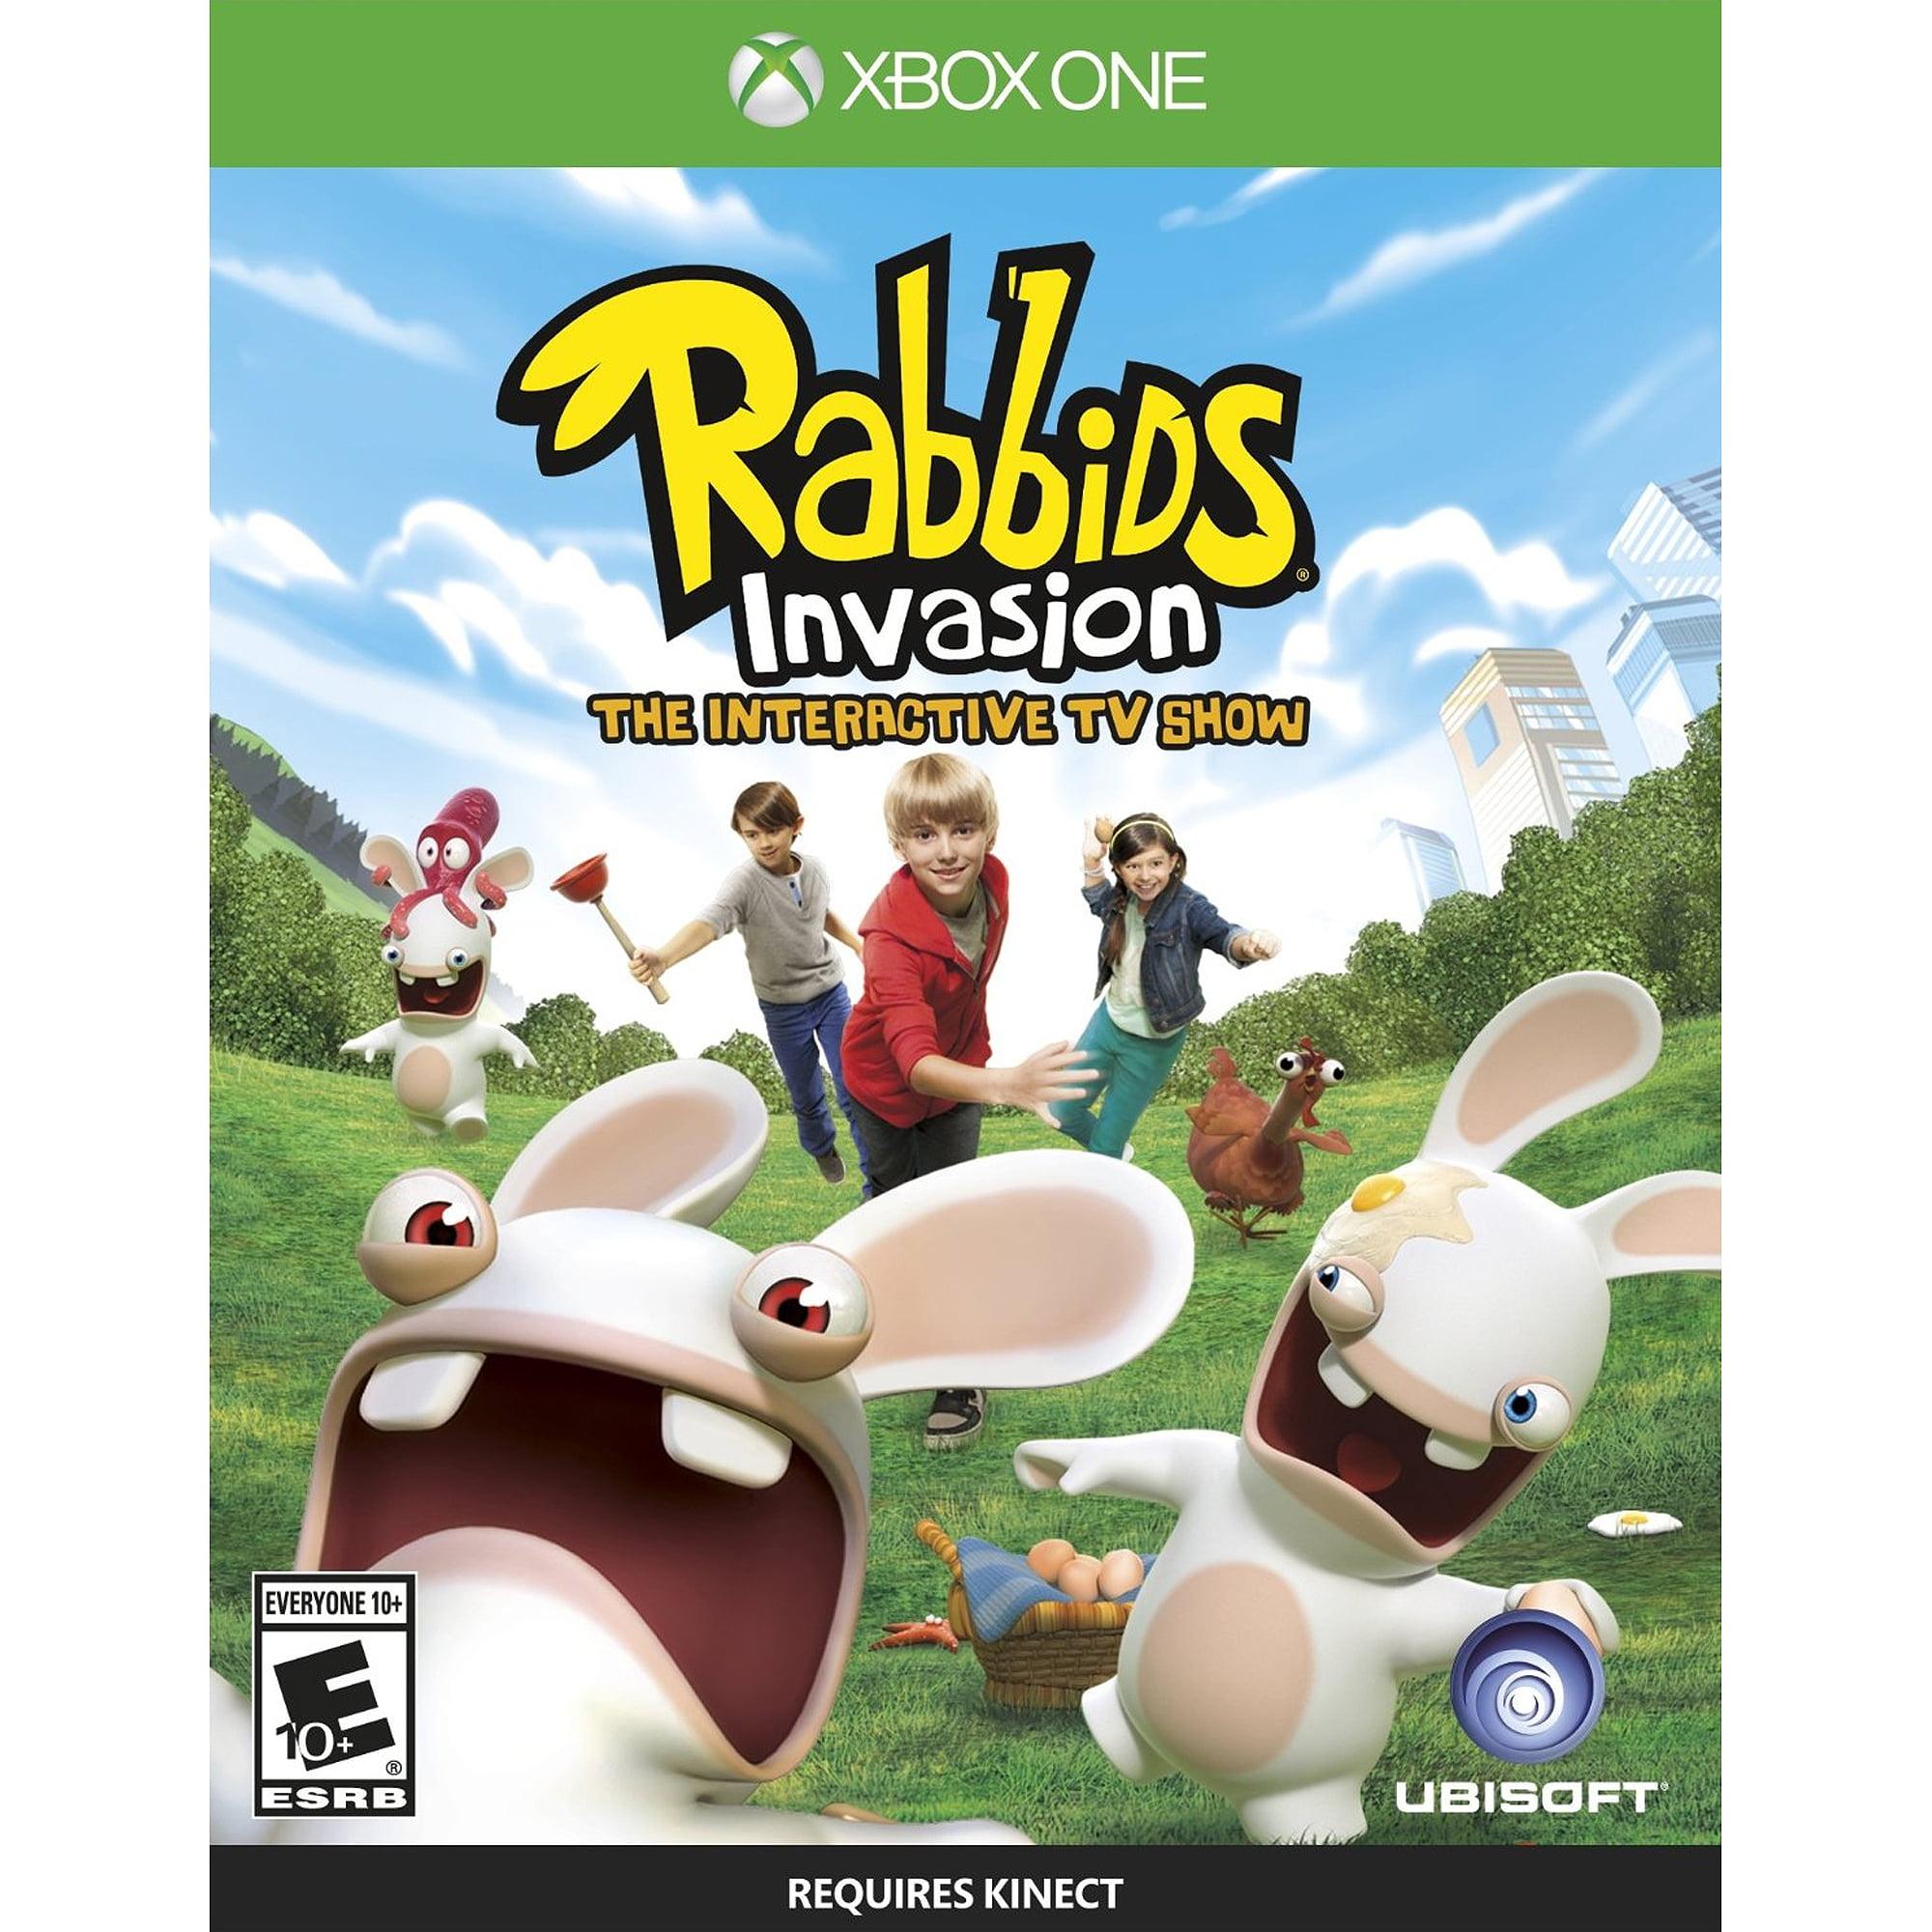 Rabbids Invasion (Xbox One) Ubisoft, 887256301767